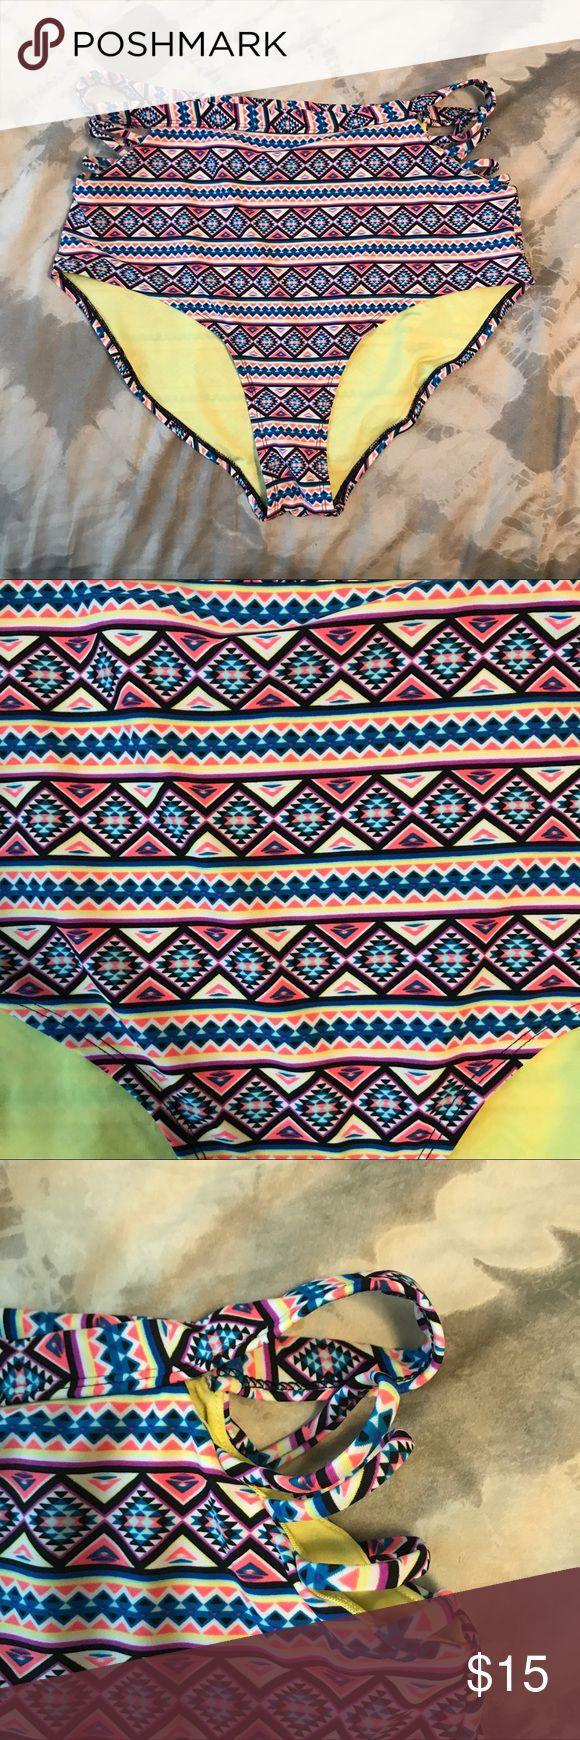 High waist bikini bottoms with cut out High waist bikini bottoms with cut out   Size 1x. In great condition. Forever 21 Swim Bikinis